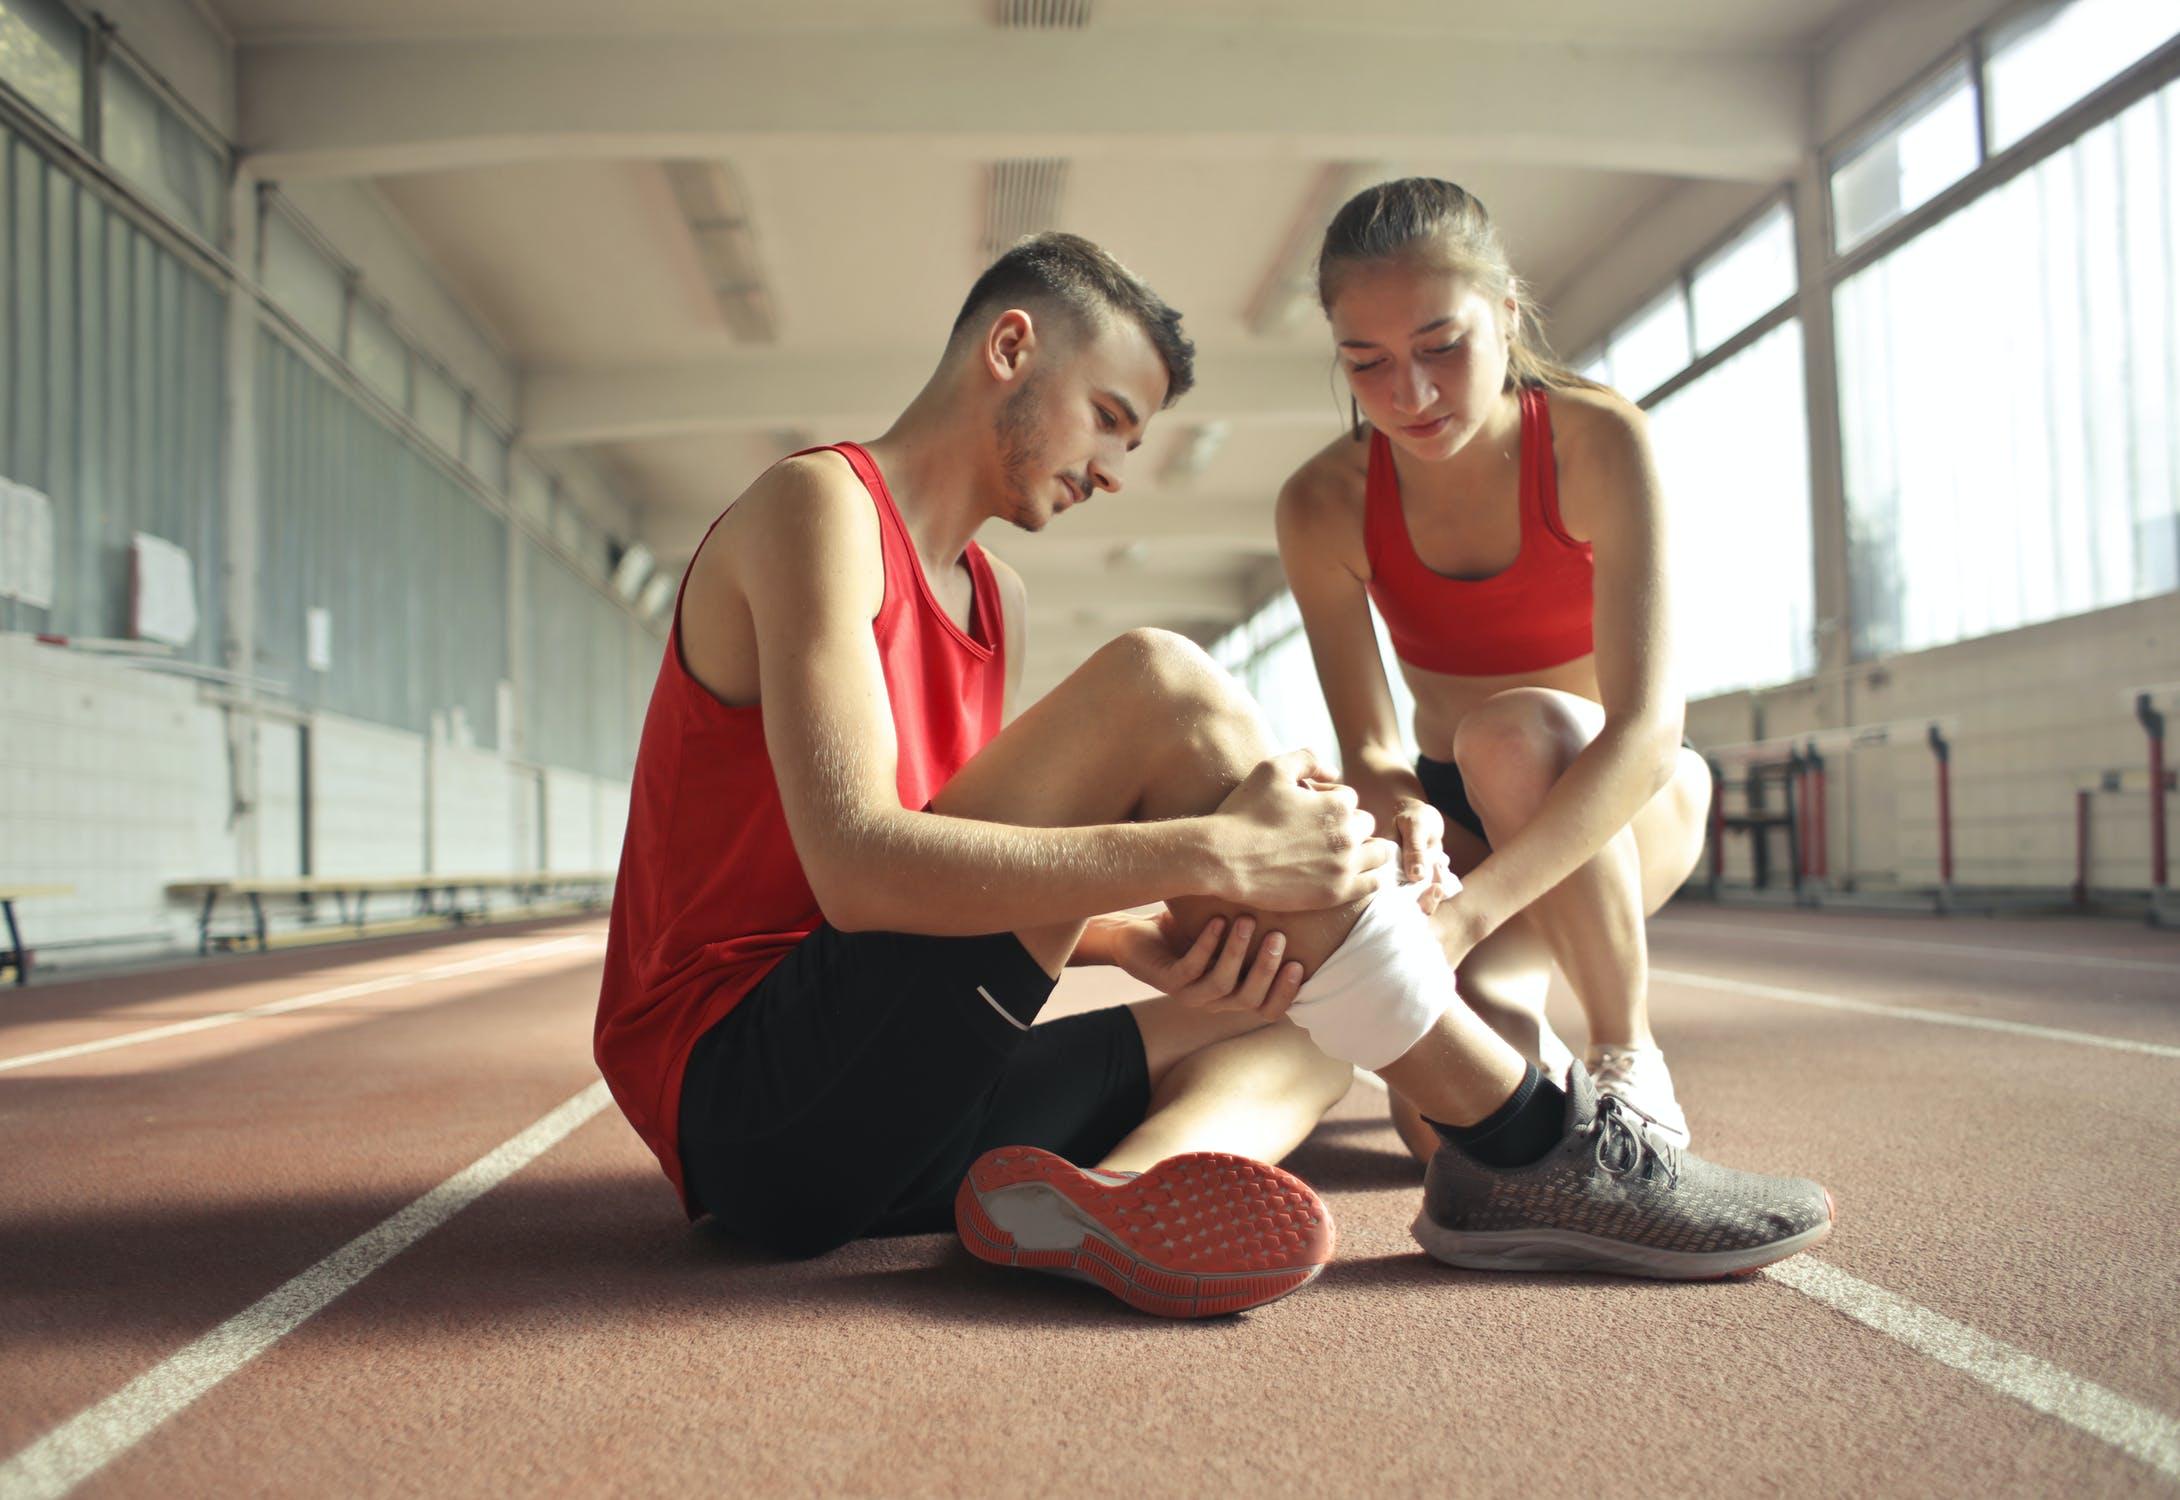 Sports Injury Care